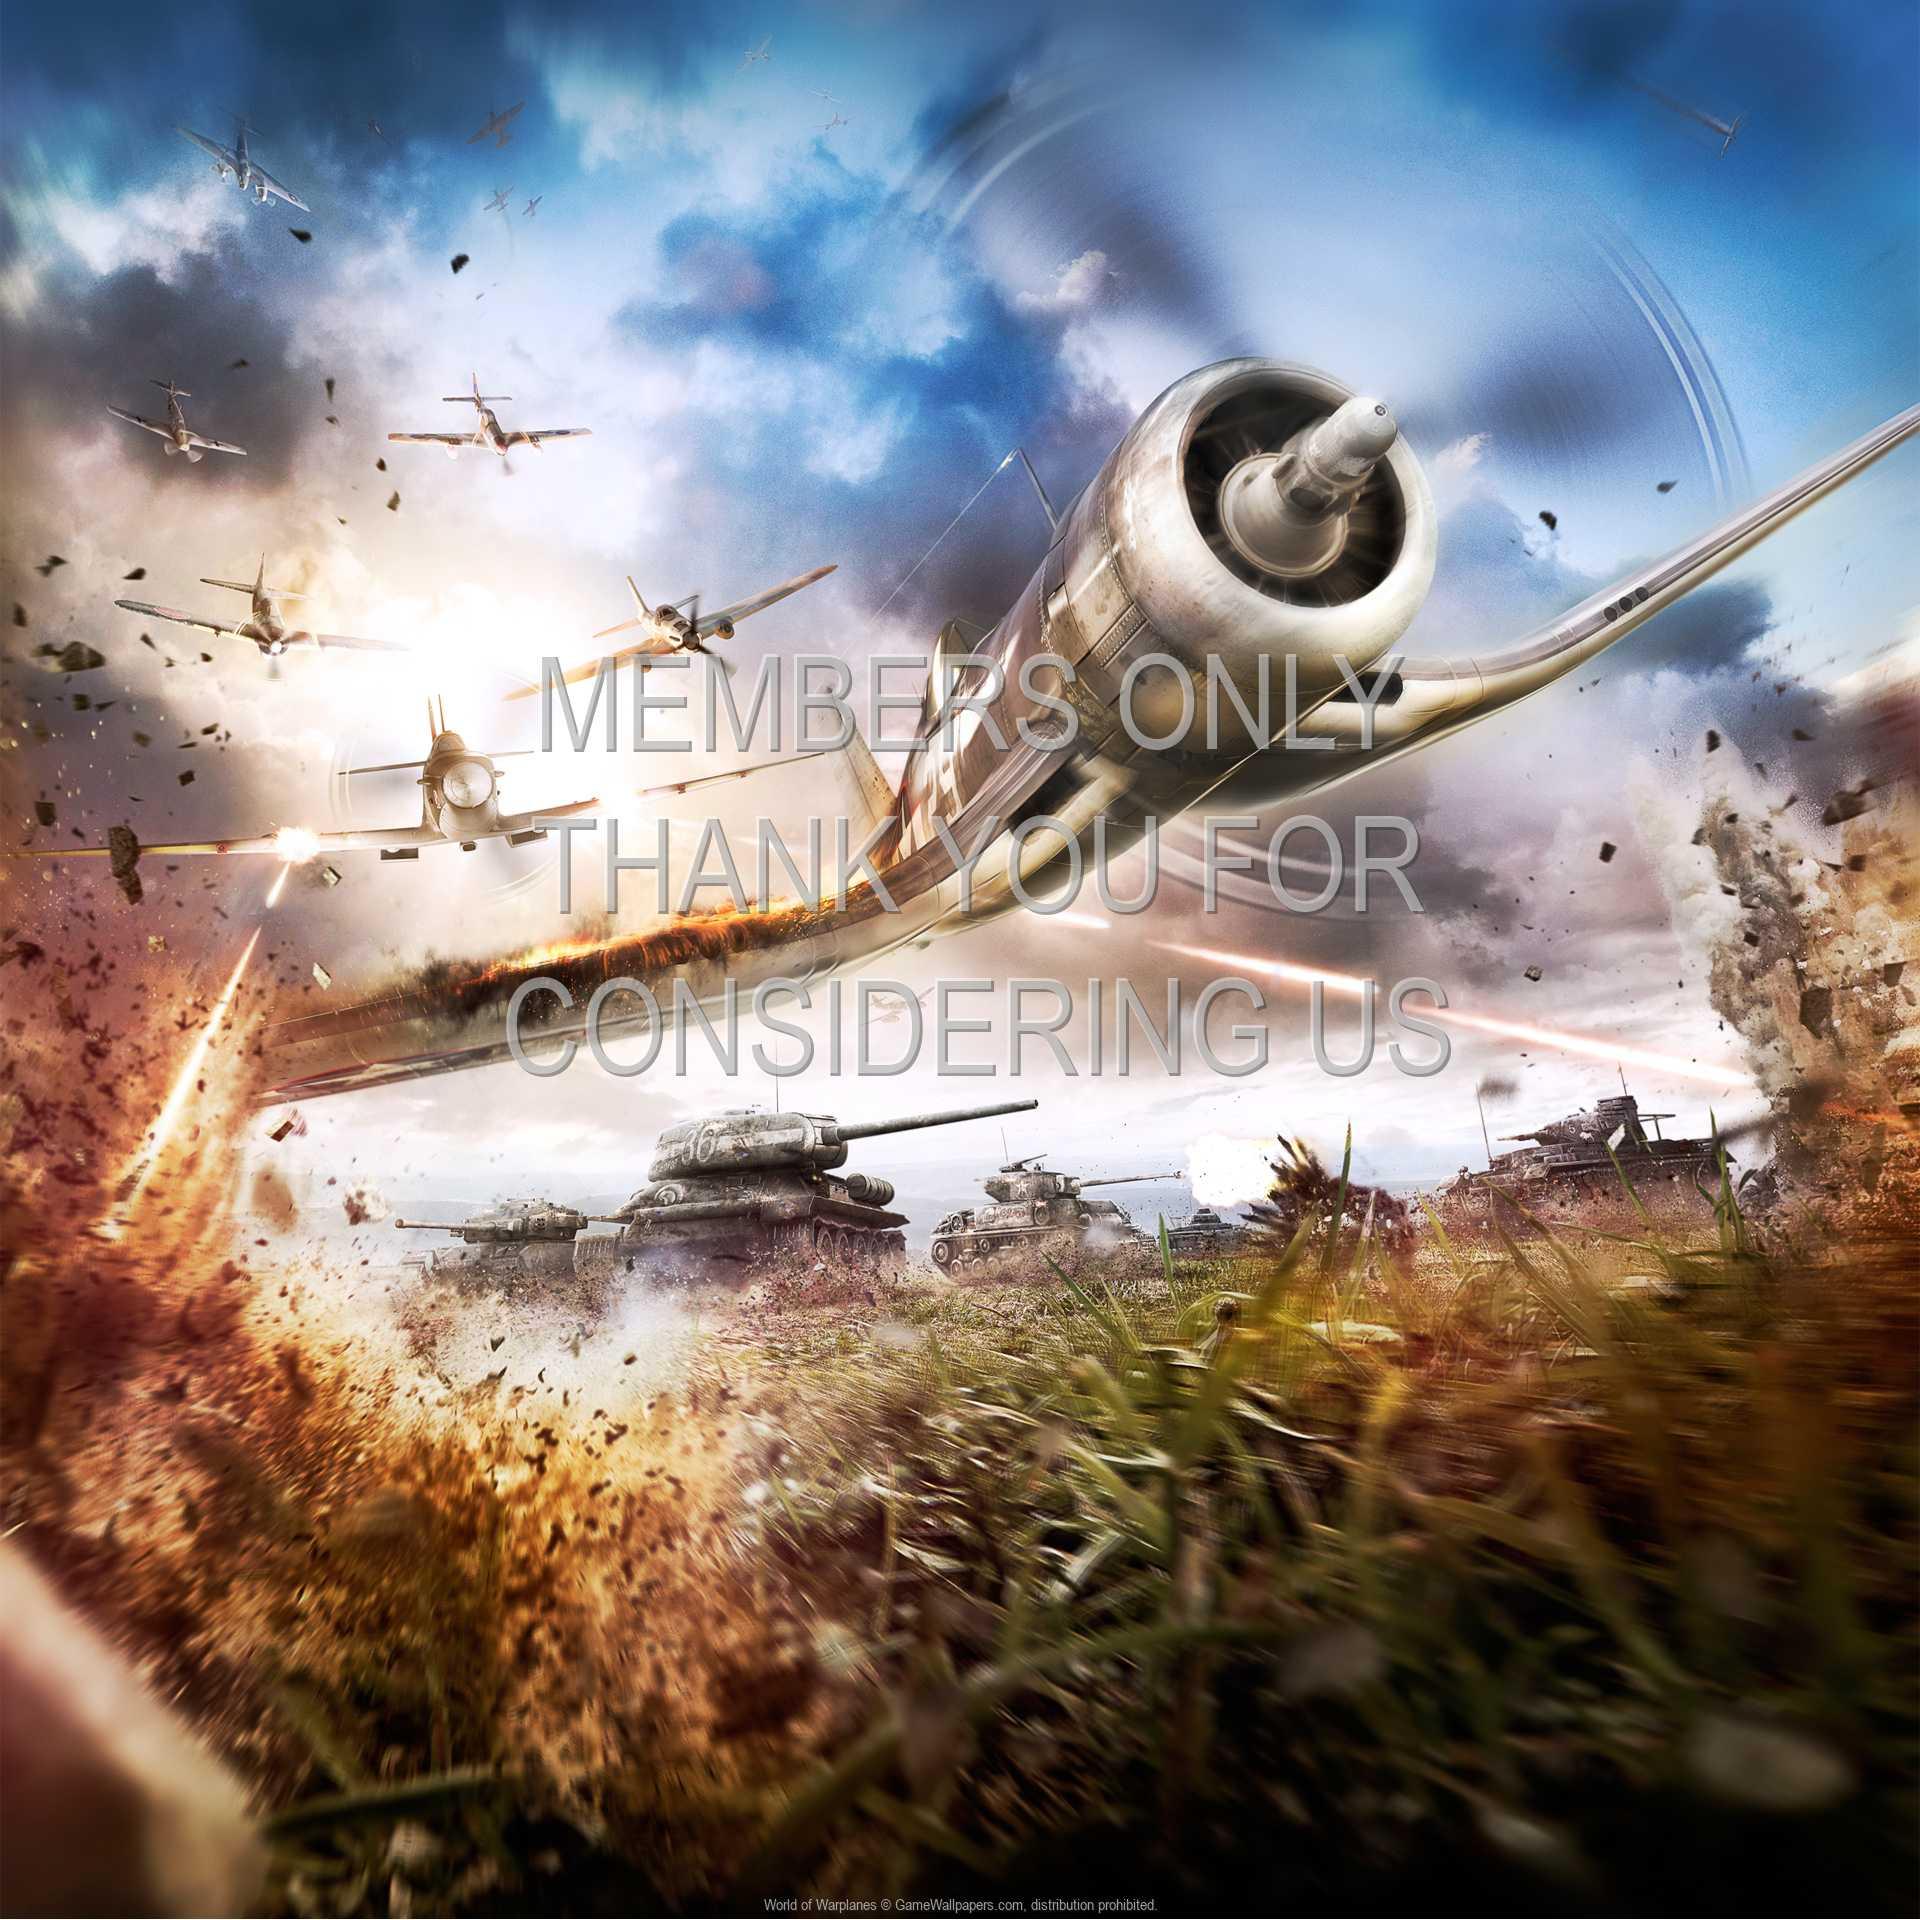 World of Warplanes 1080p Horizontal Mobile wallpaper or background 04